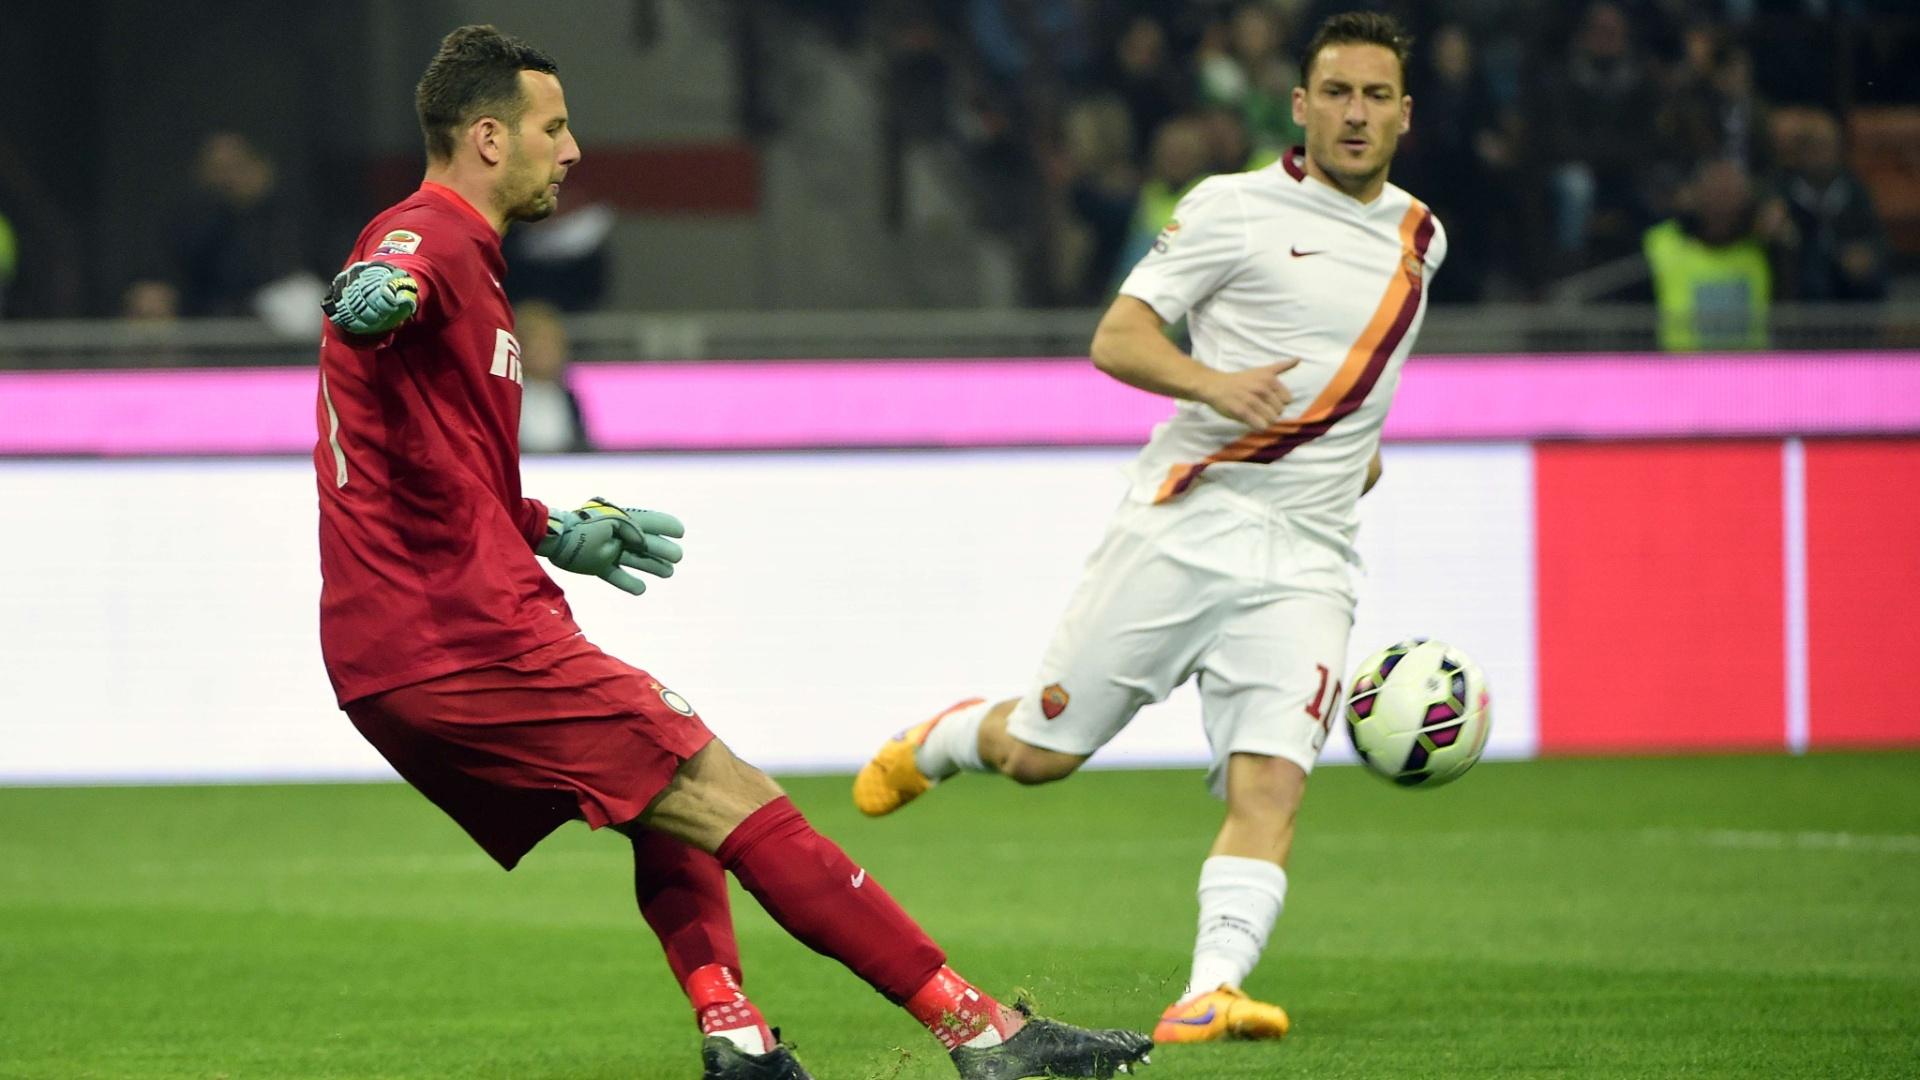 Francesco Totti disputa bola com Handanovic